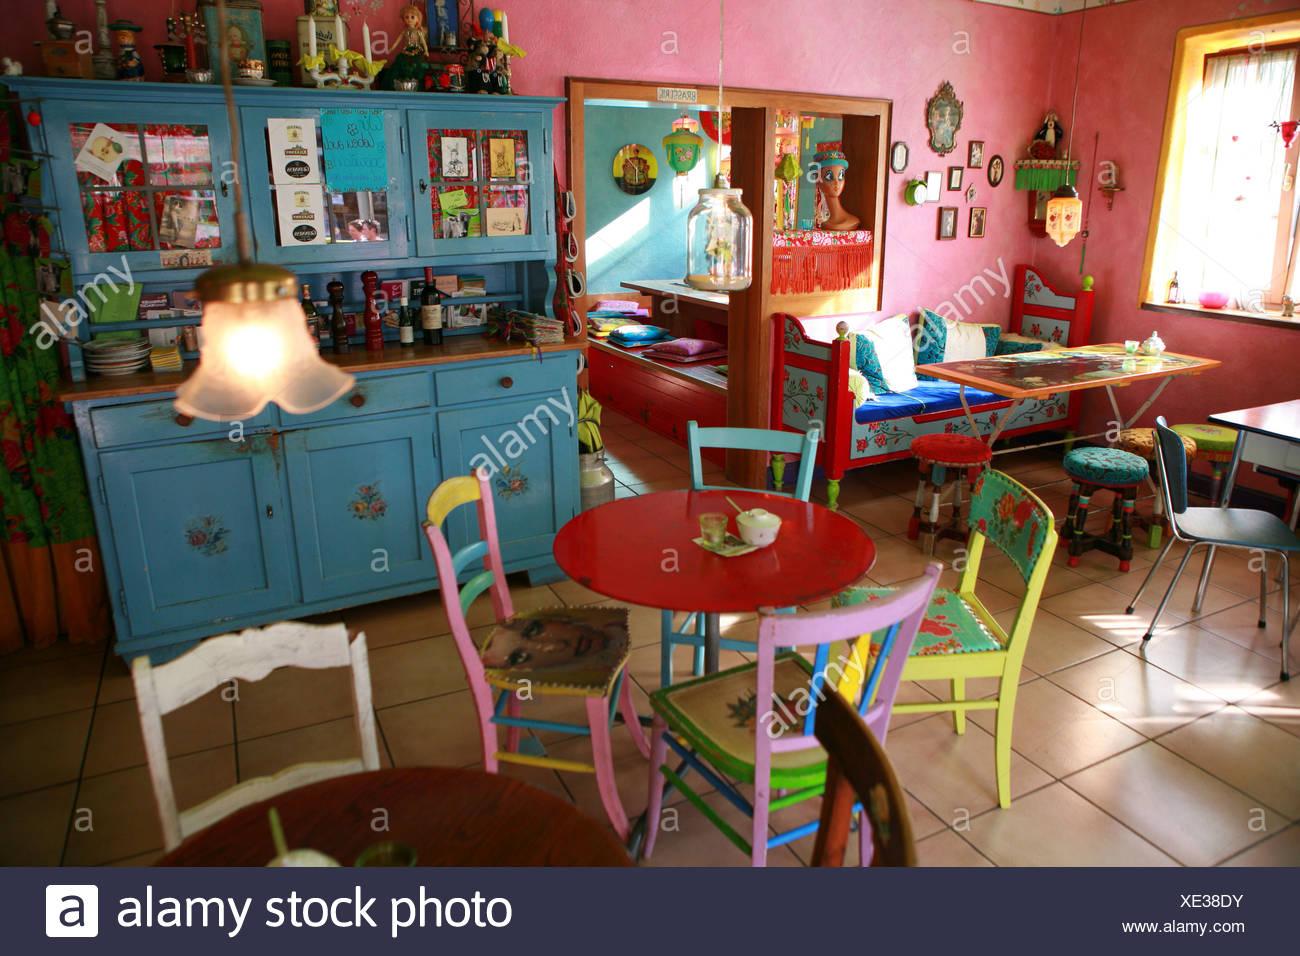 farbige mobel in einem cafe